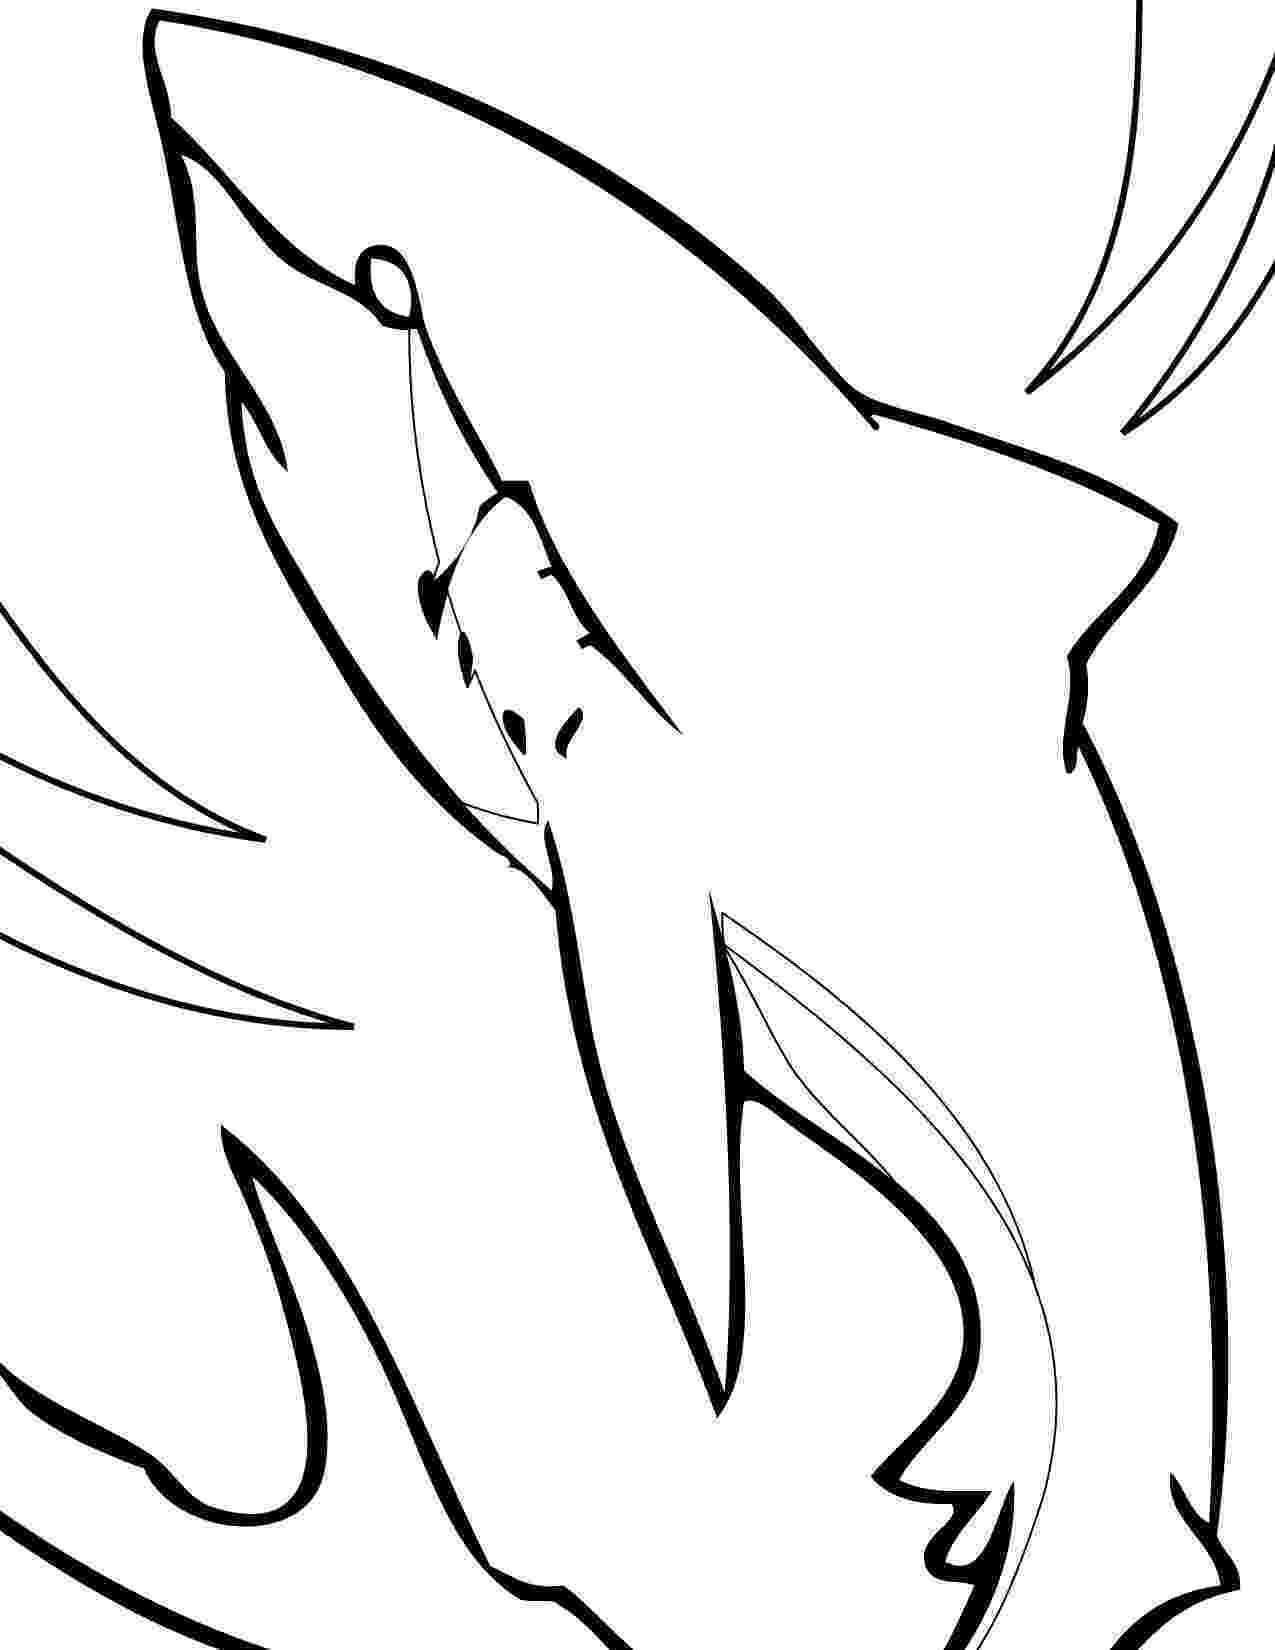 coloring page of shark free printable shark coloring pages for kids shark page coloring of